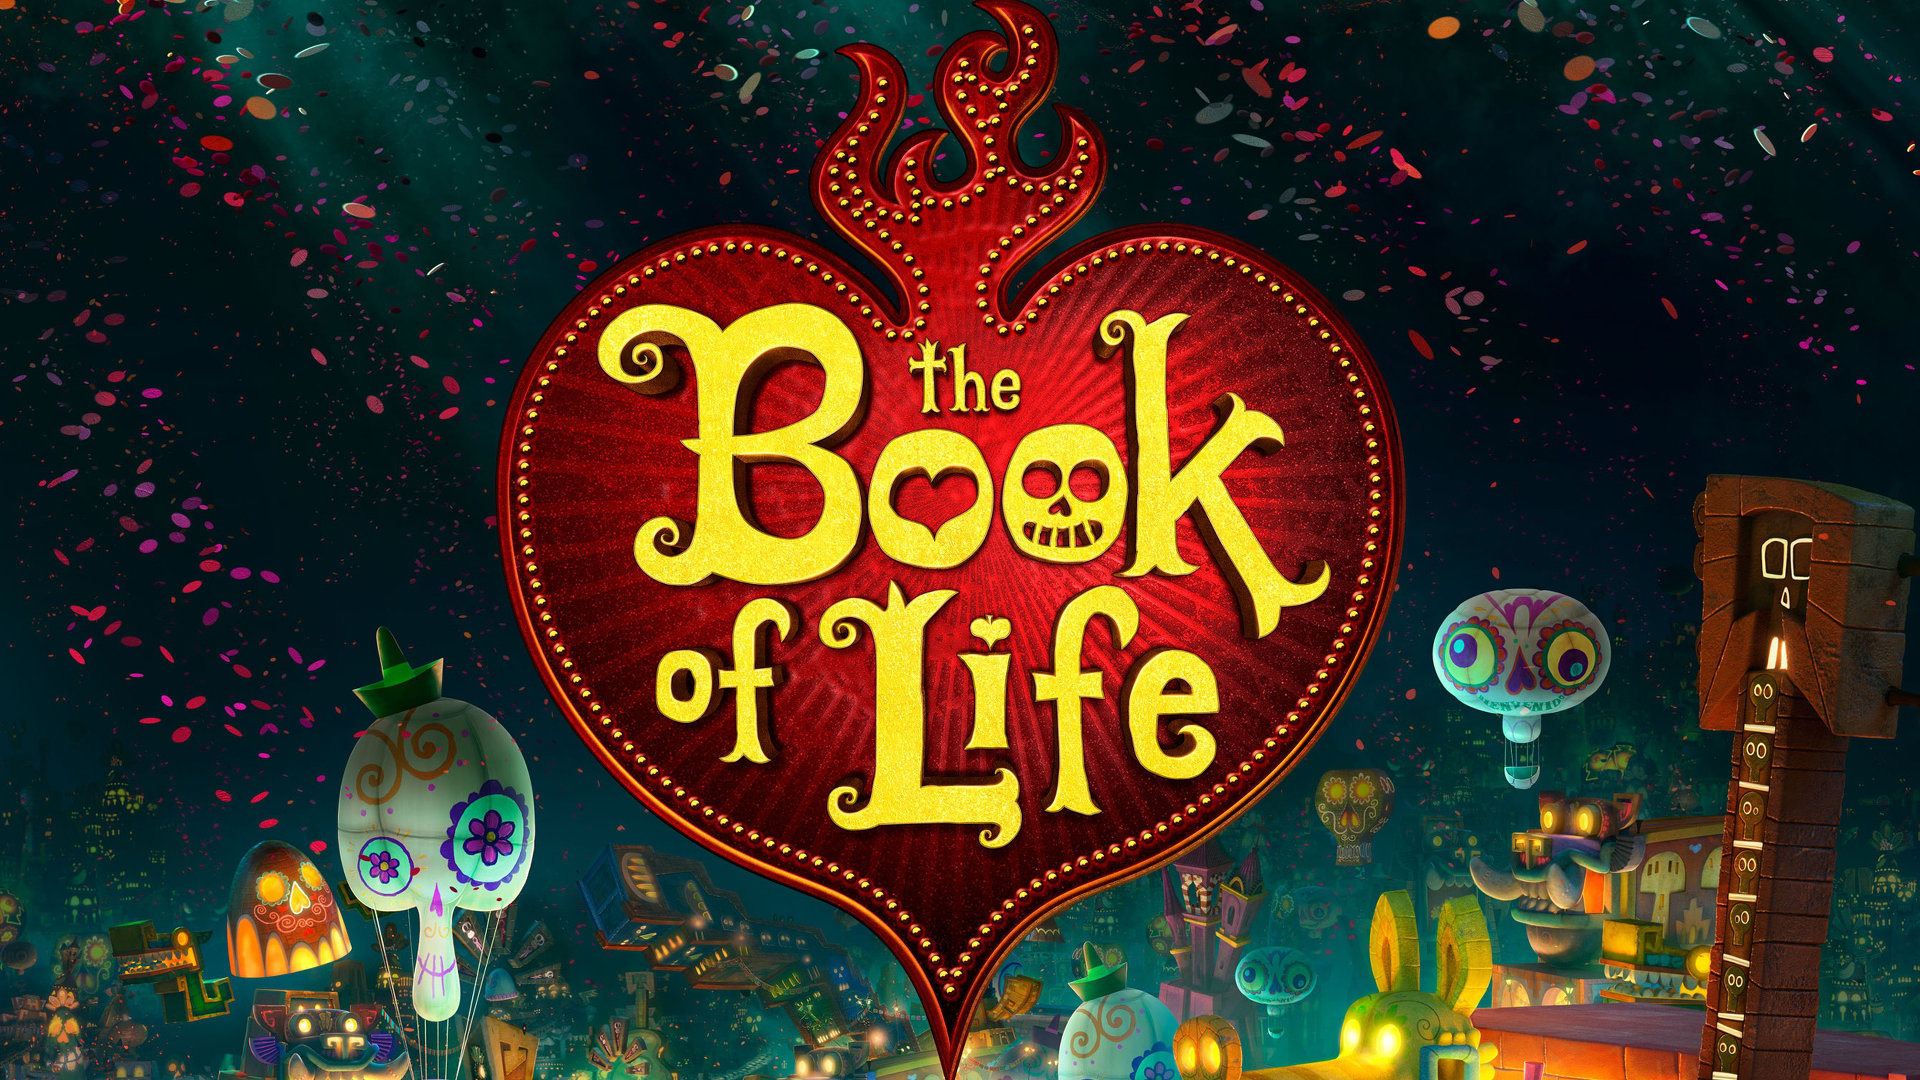 The Book Of Life Wallpapers 1920x1080 Full Hd 1080p Desktop